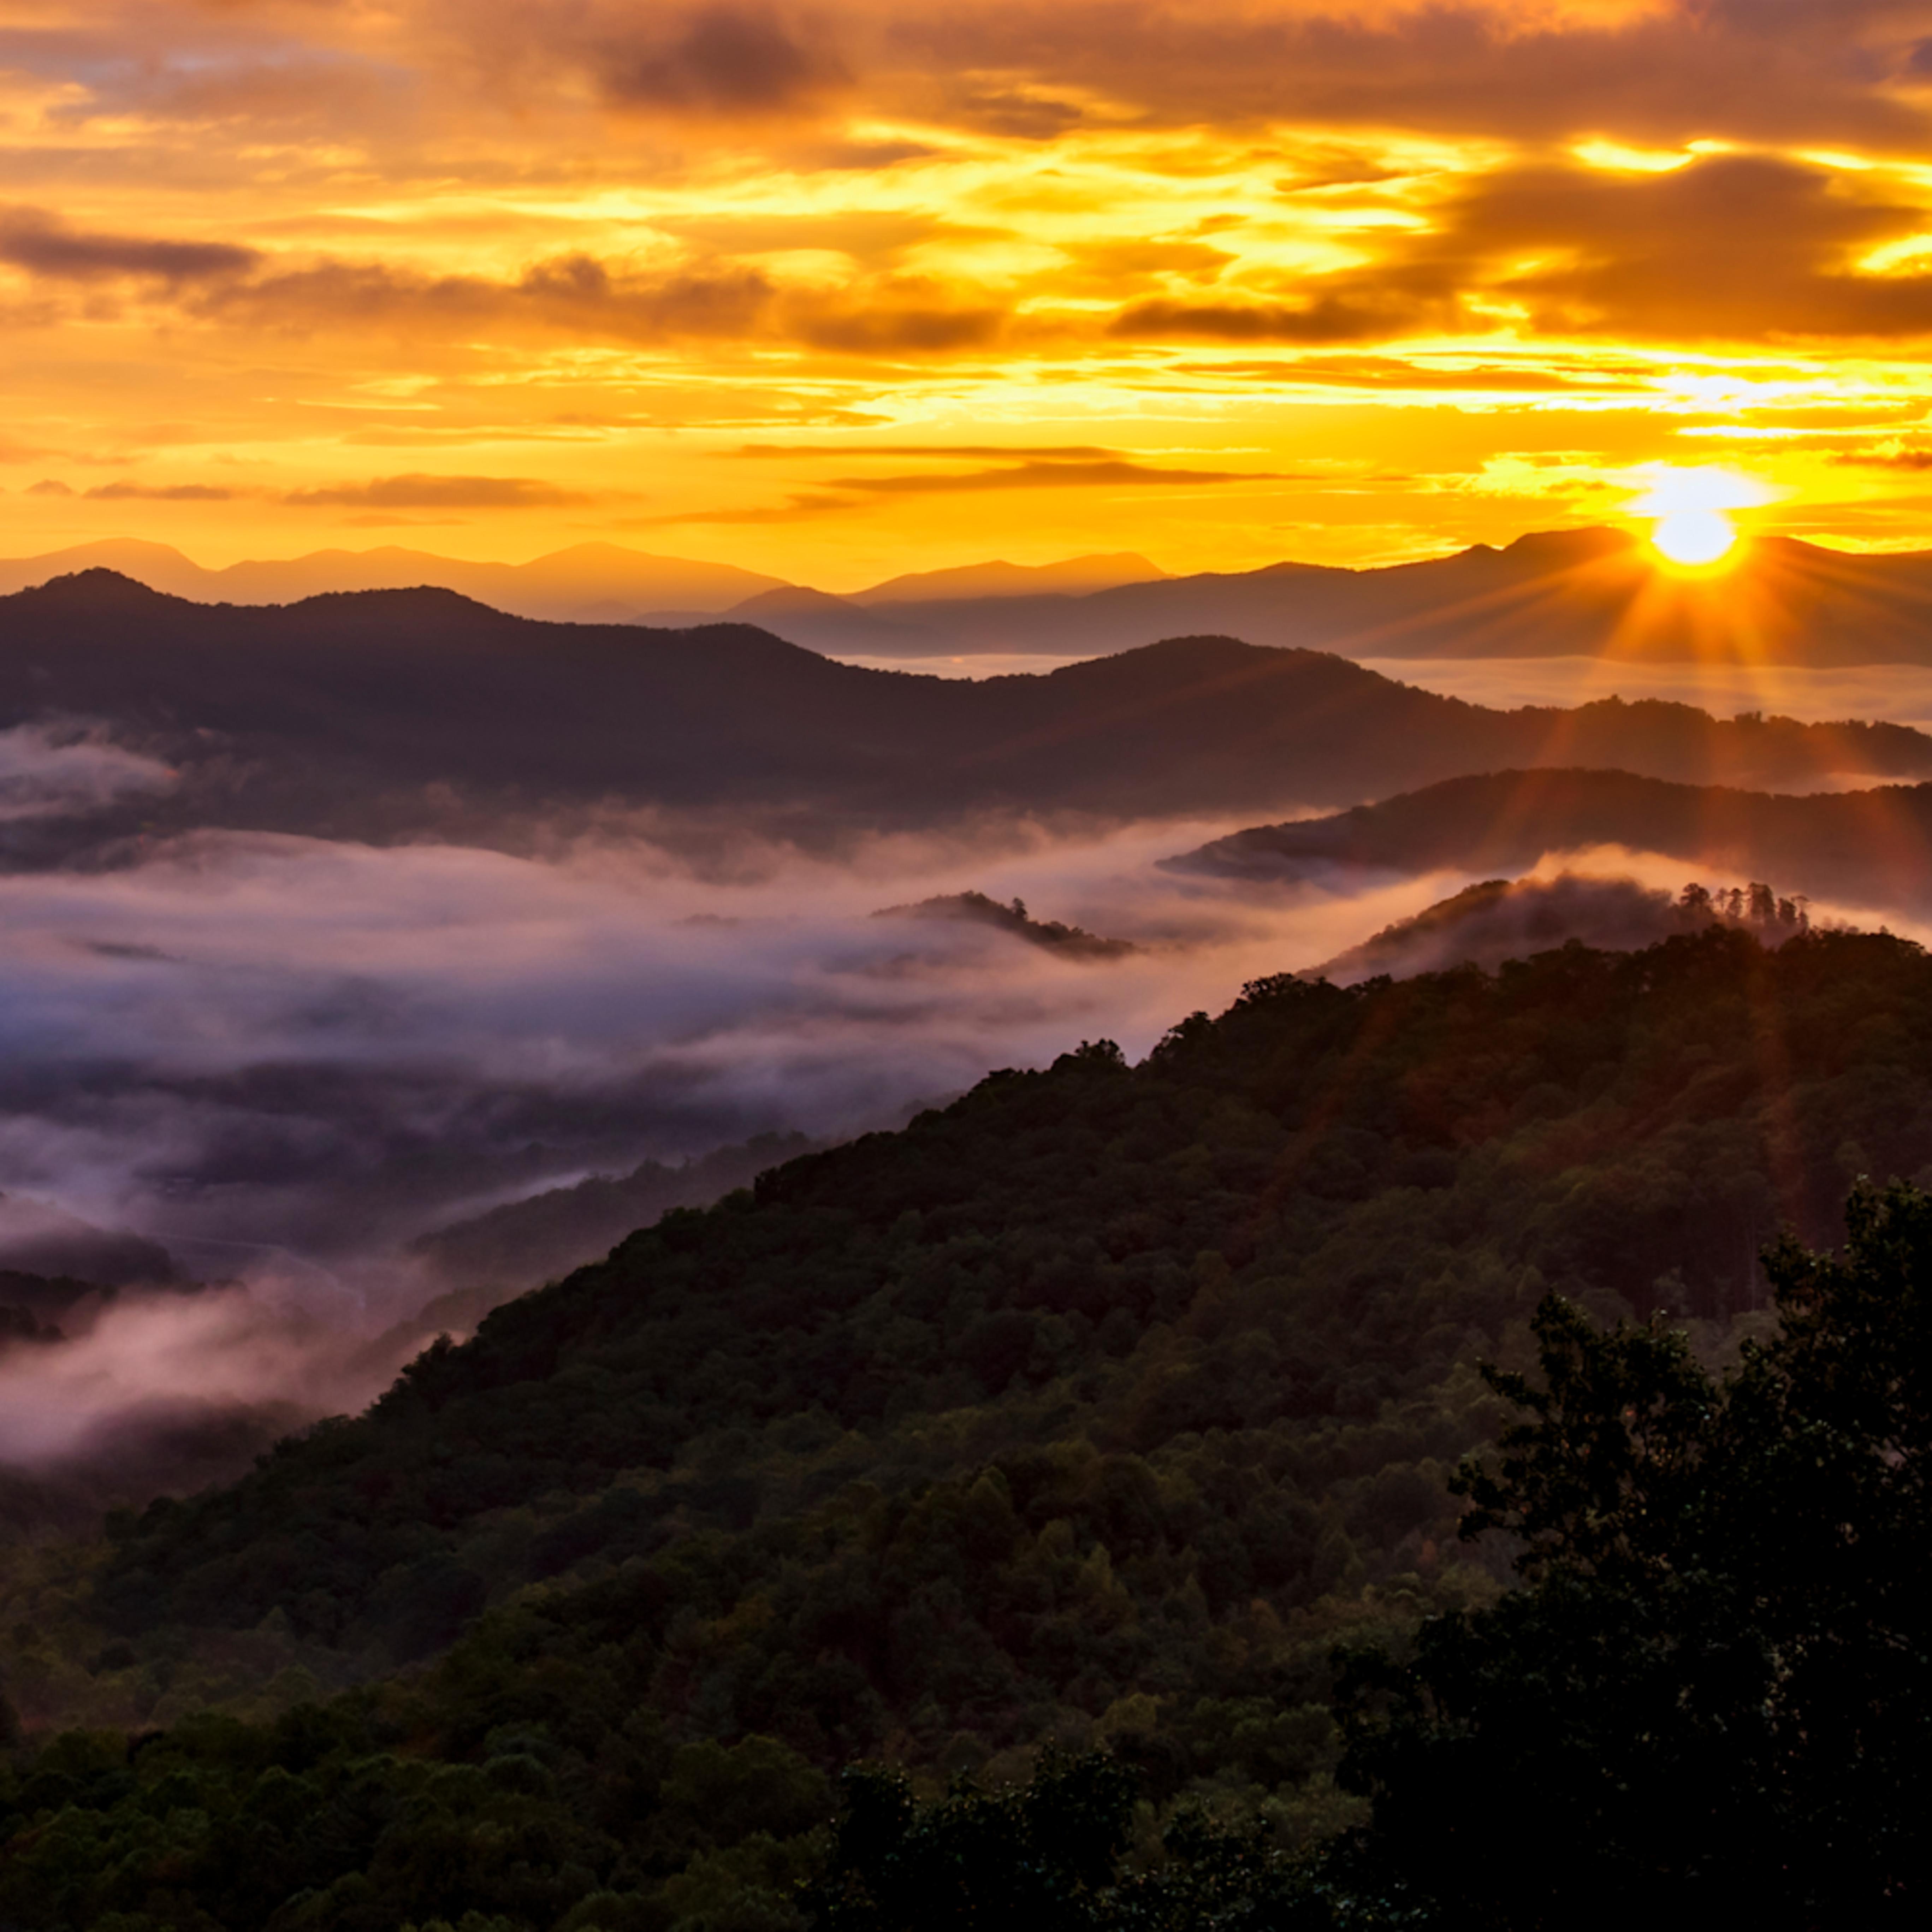 Andy crawford photography smoky mountains 20171011 5 s6ktde